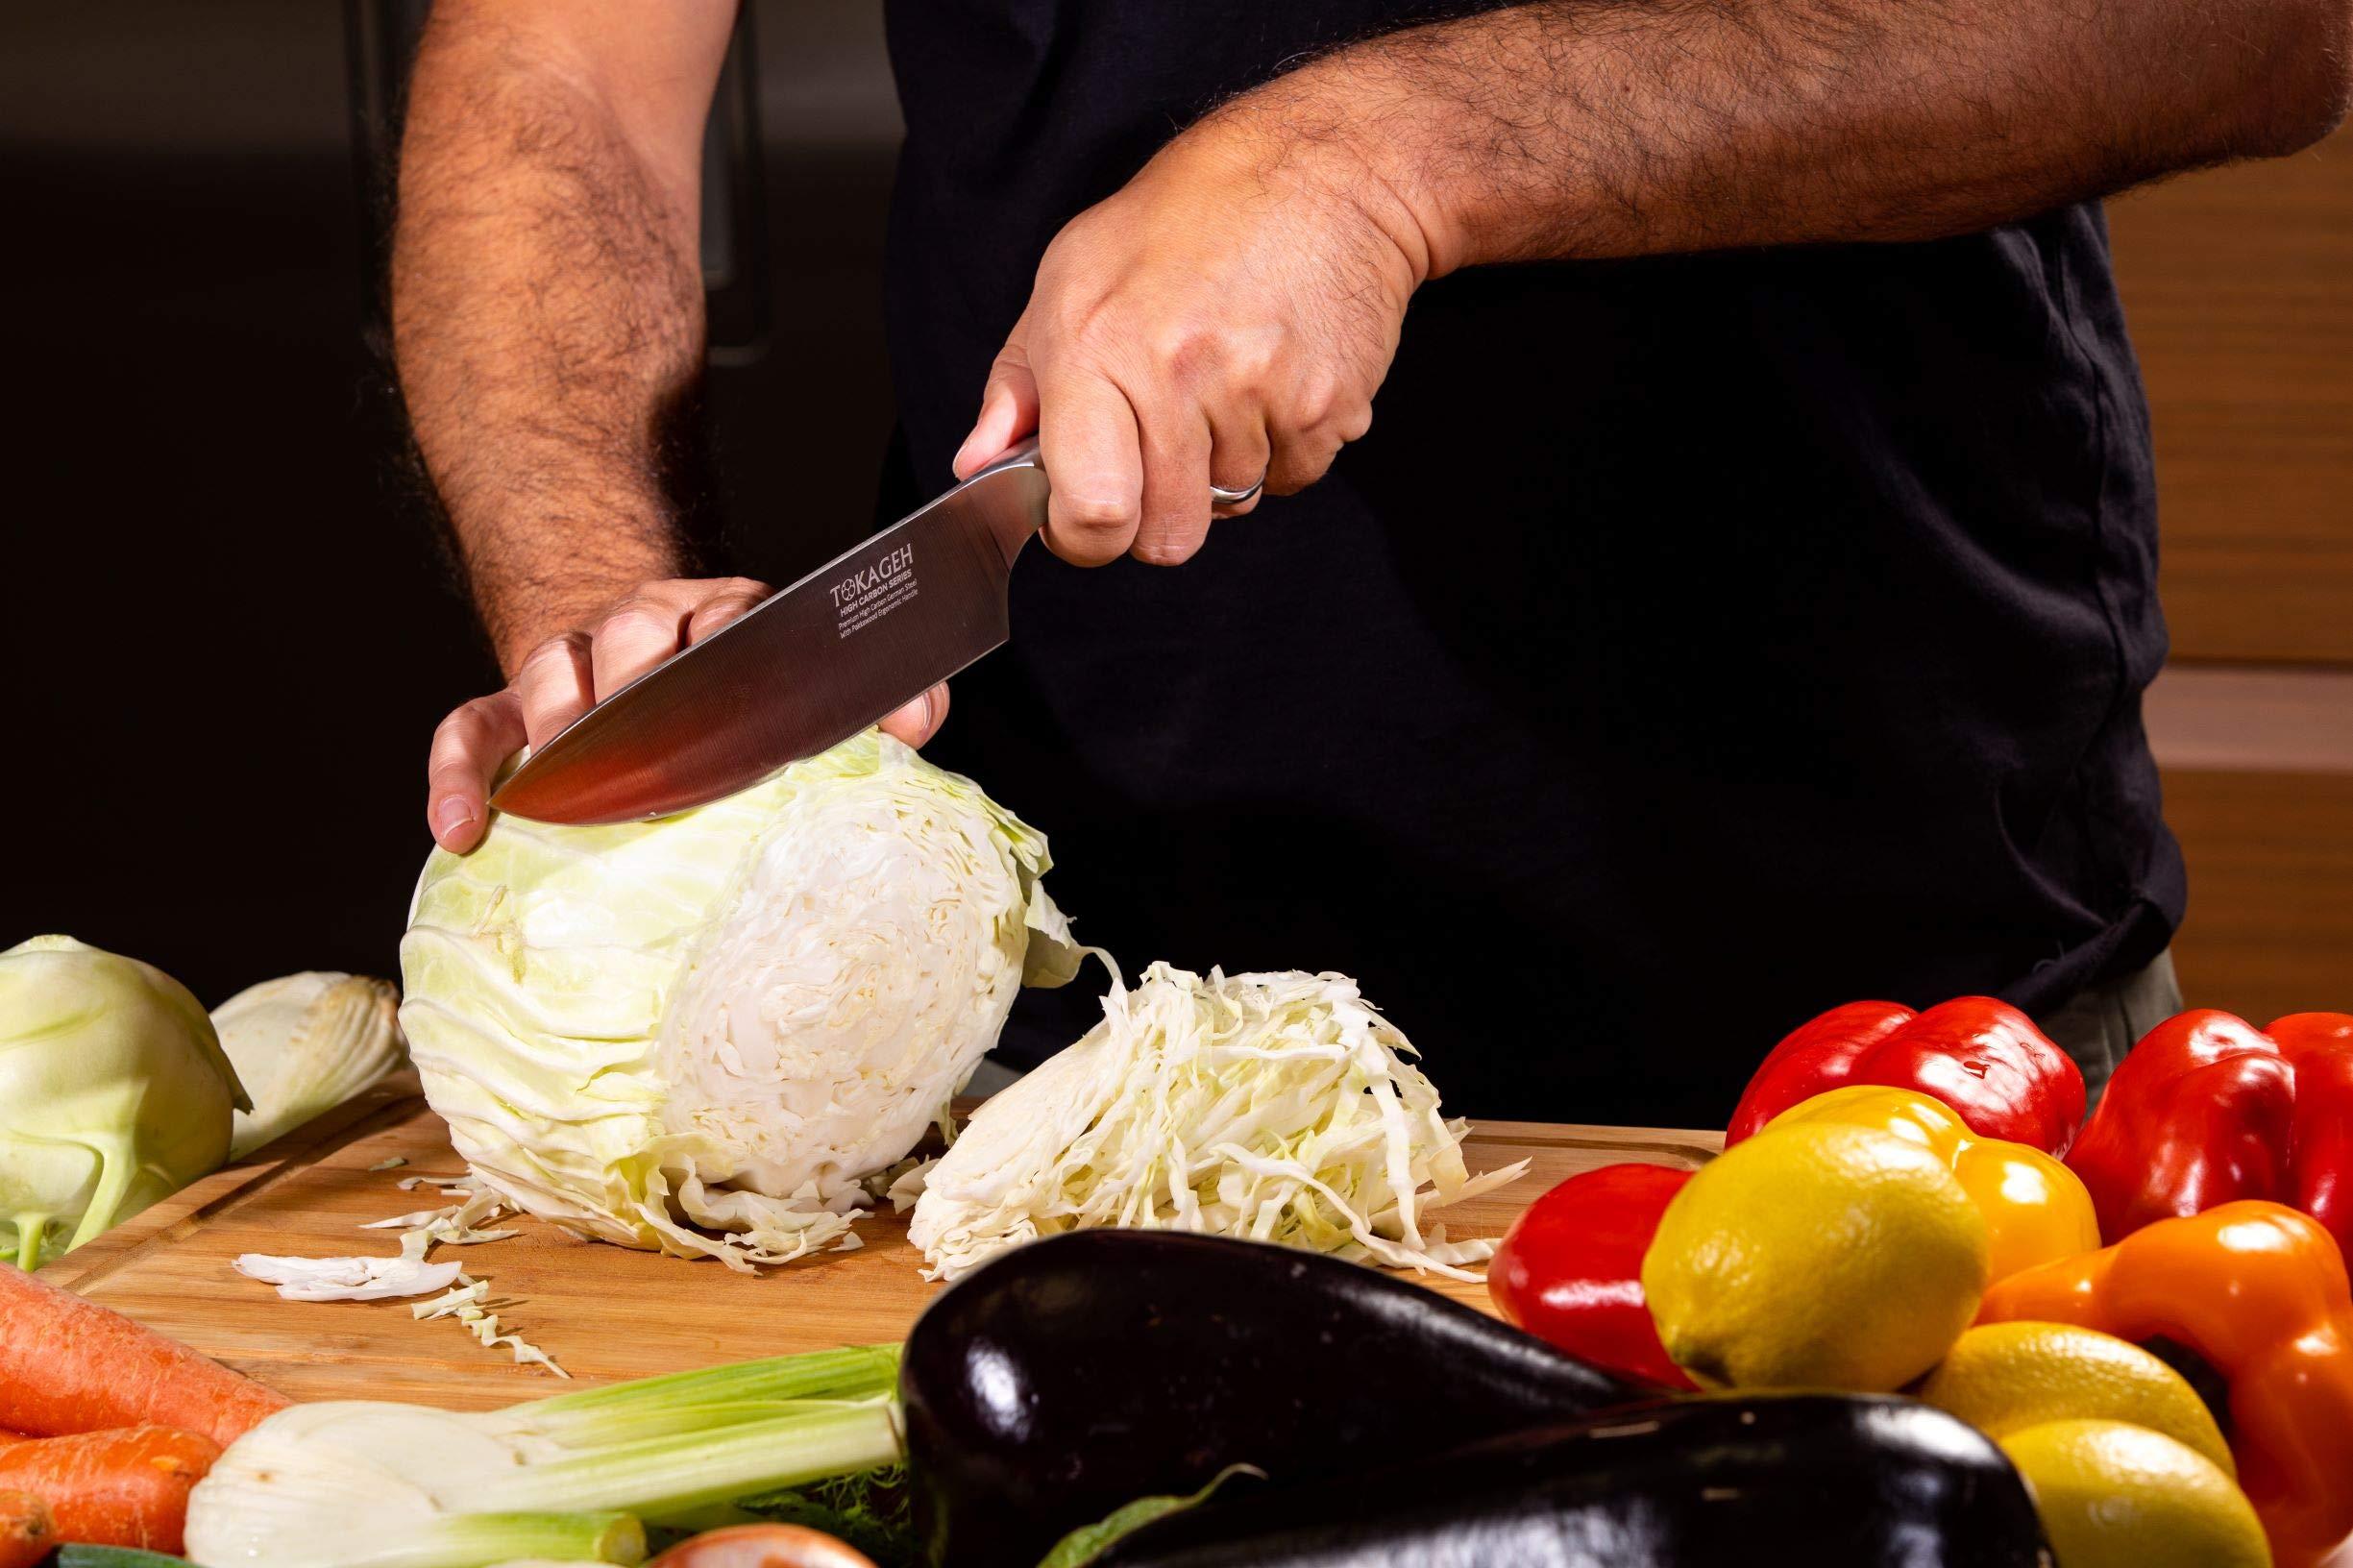 TOKAGEH Chef Knife 8 inch - German High Carbon Steel Pakka Wood Handle by TOKAGEH (Image #2)